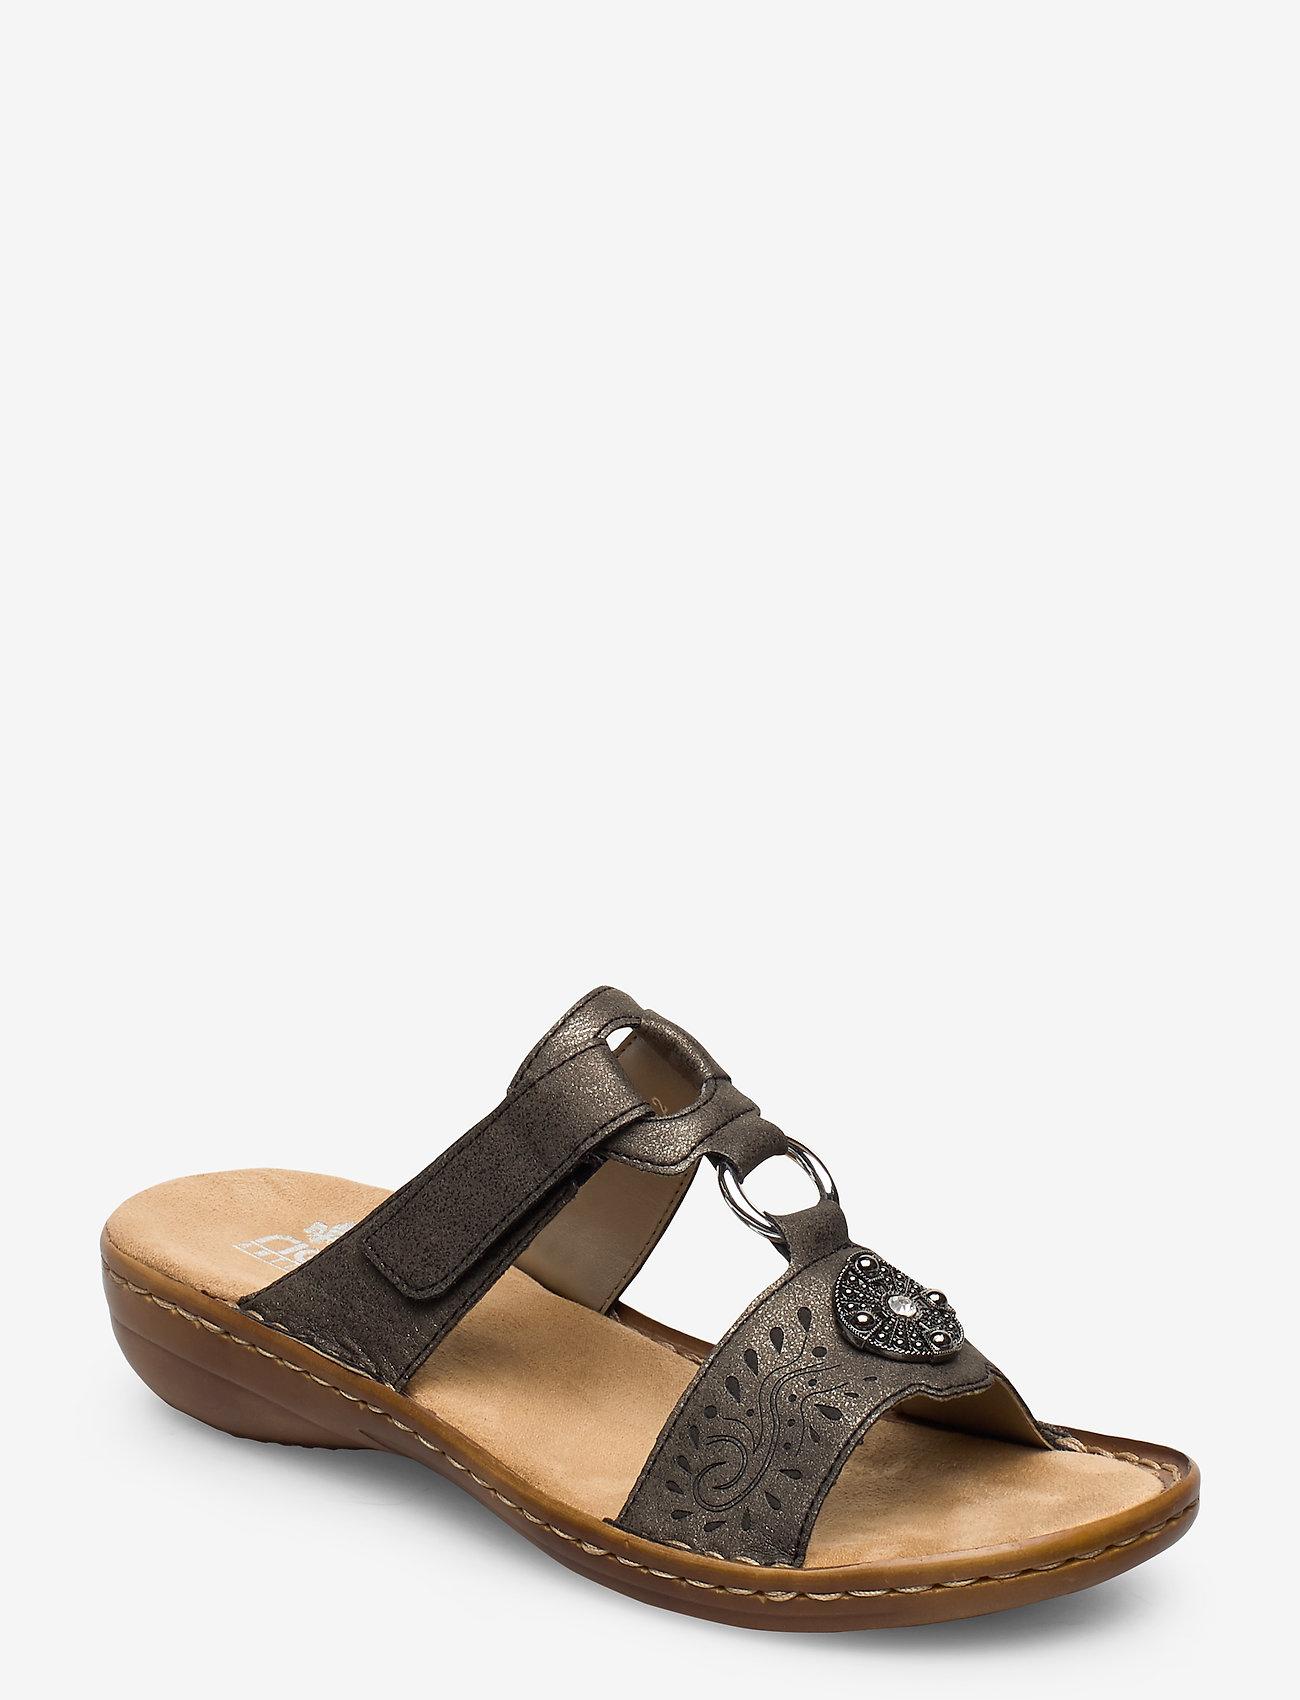 Rieker - 608K1-45 - flat sandals - grey